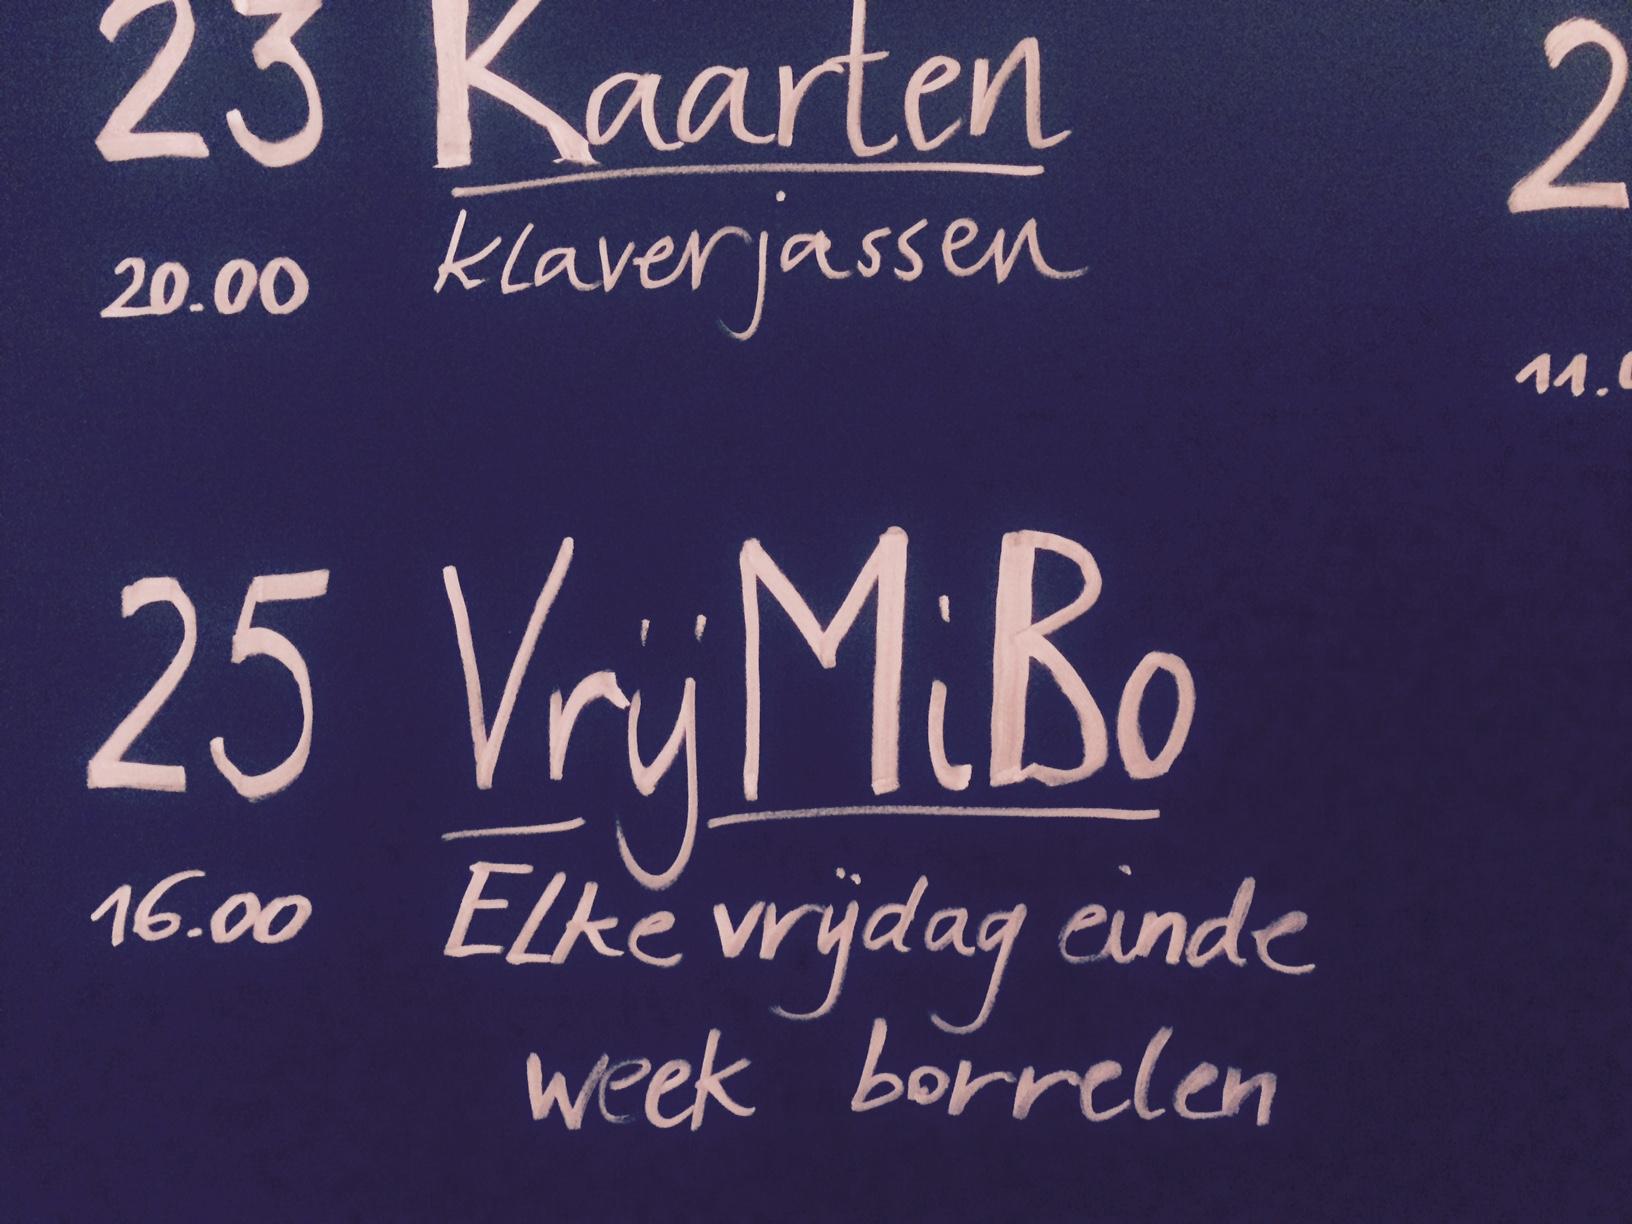 Cafe de Bieb Amsterdam VrijMiBo